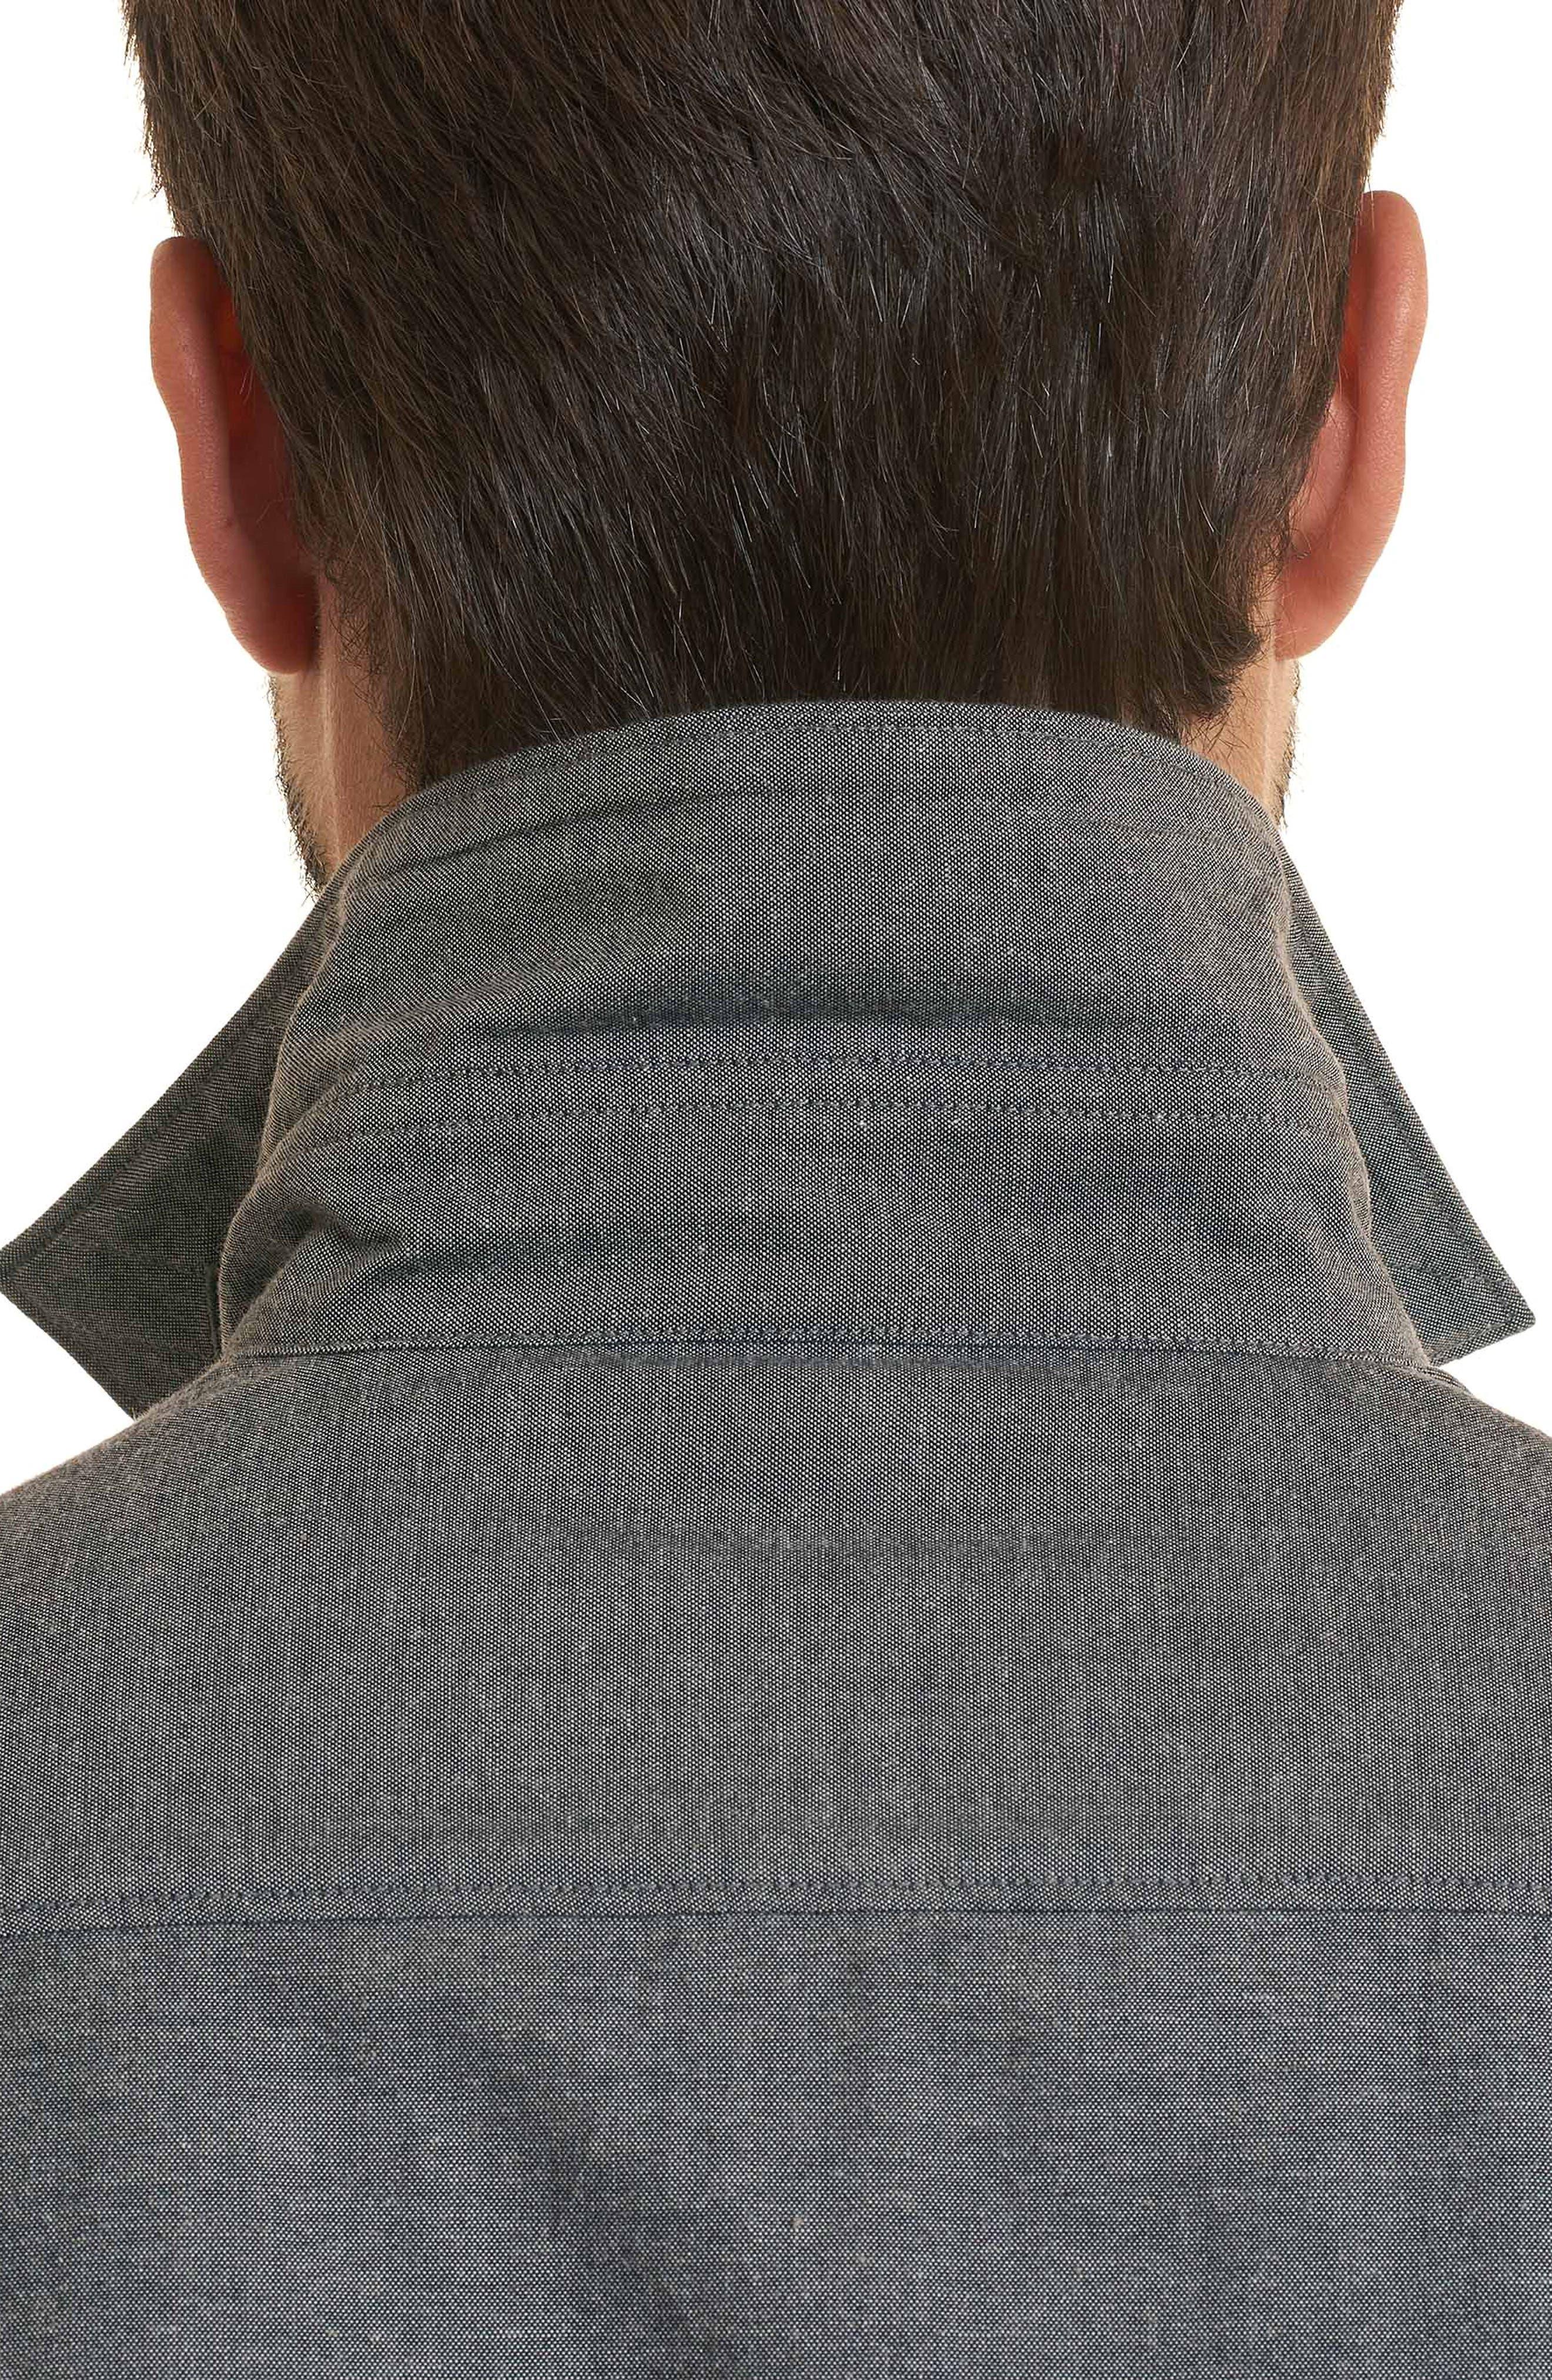 Maestre Classic Fit Sport Shirt,                             Alternate thumbnail 4, color,                             Grey